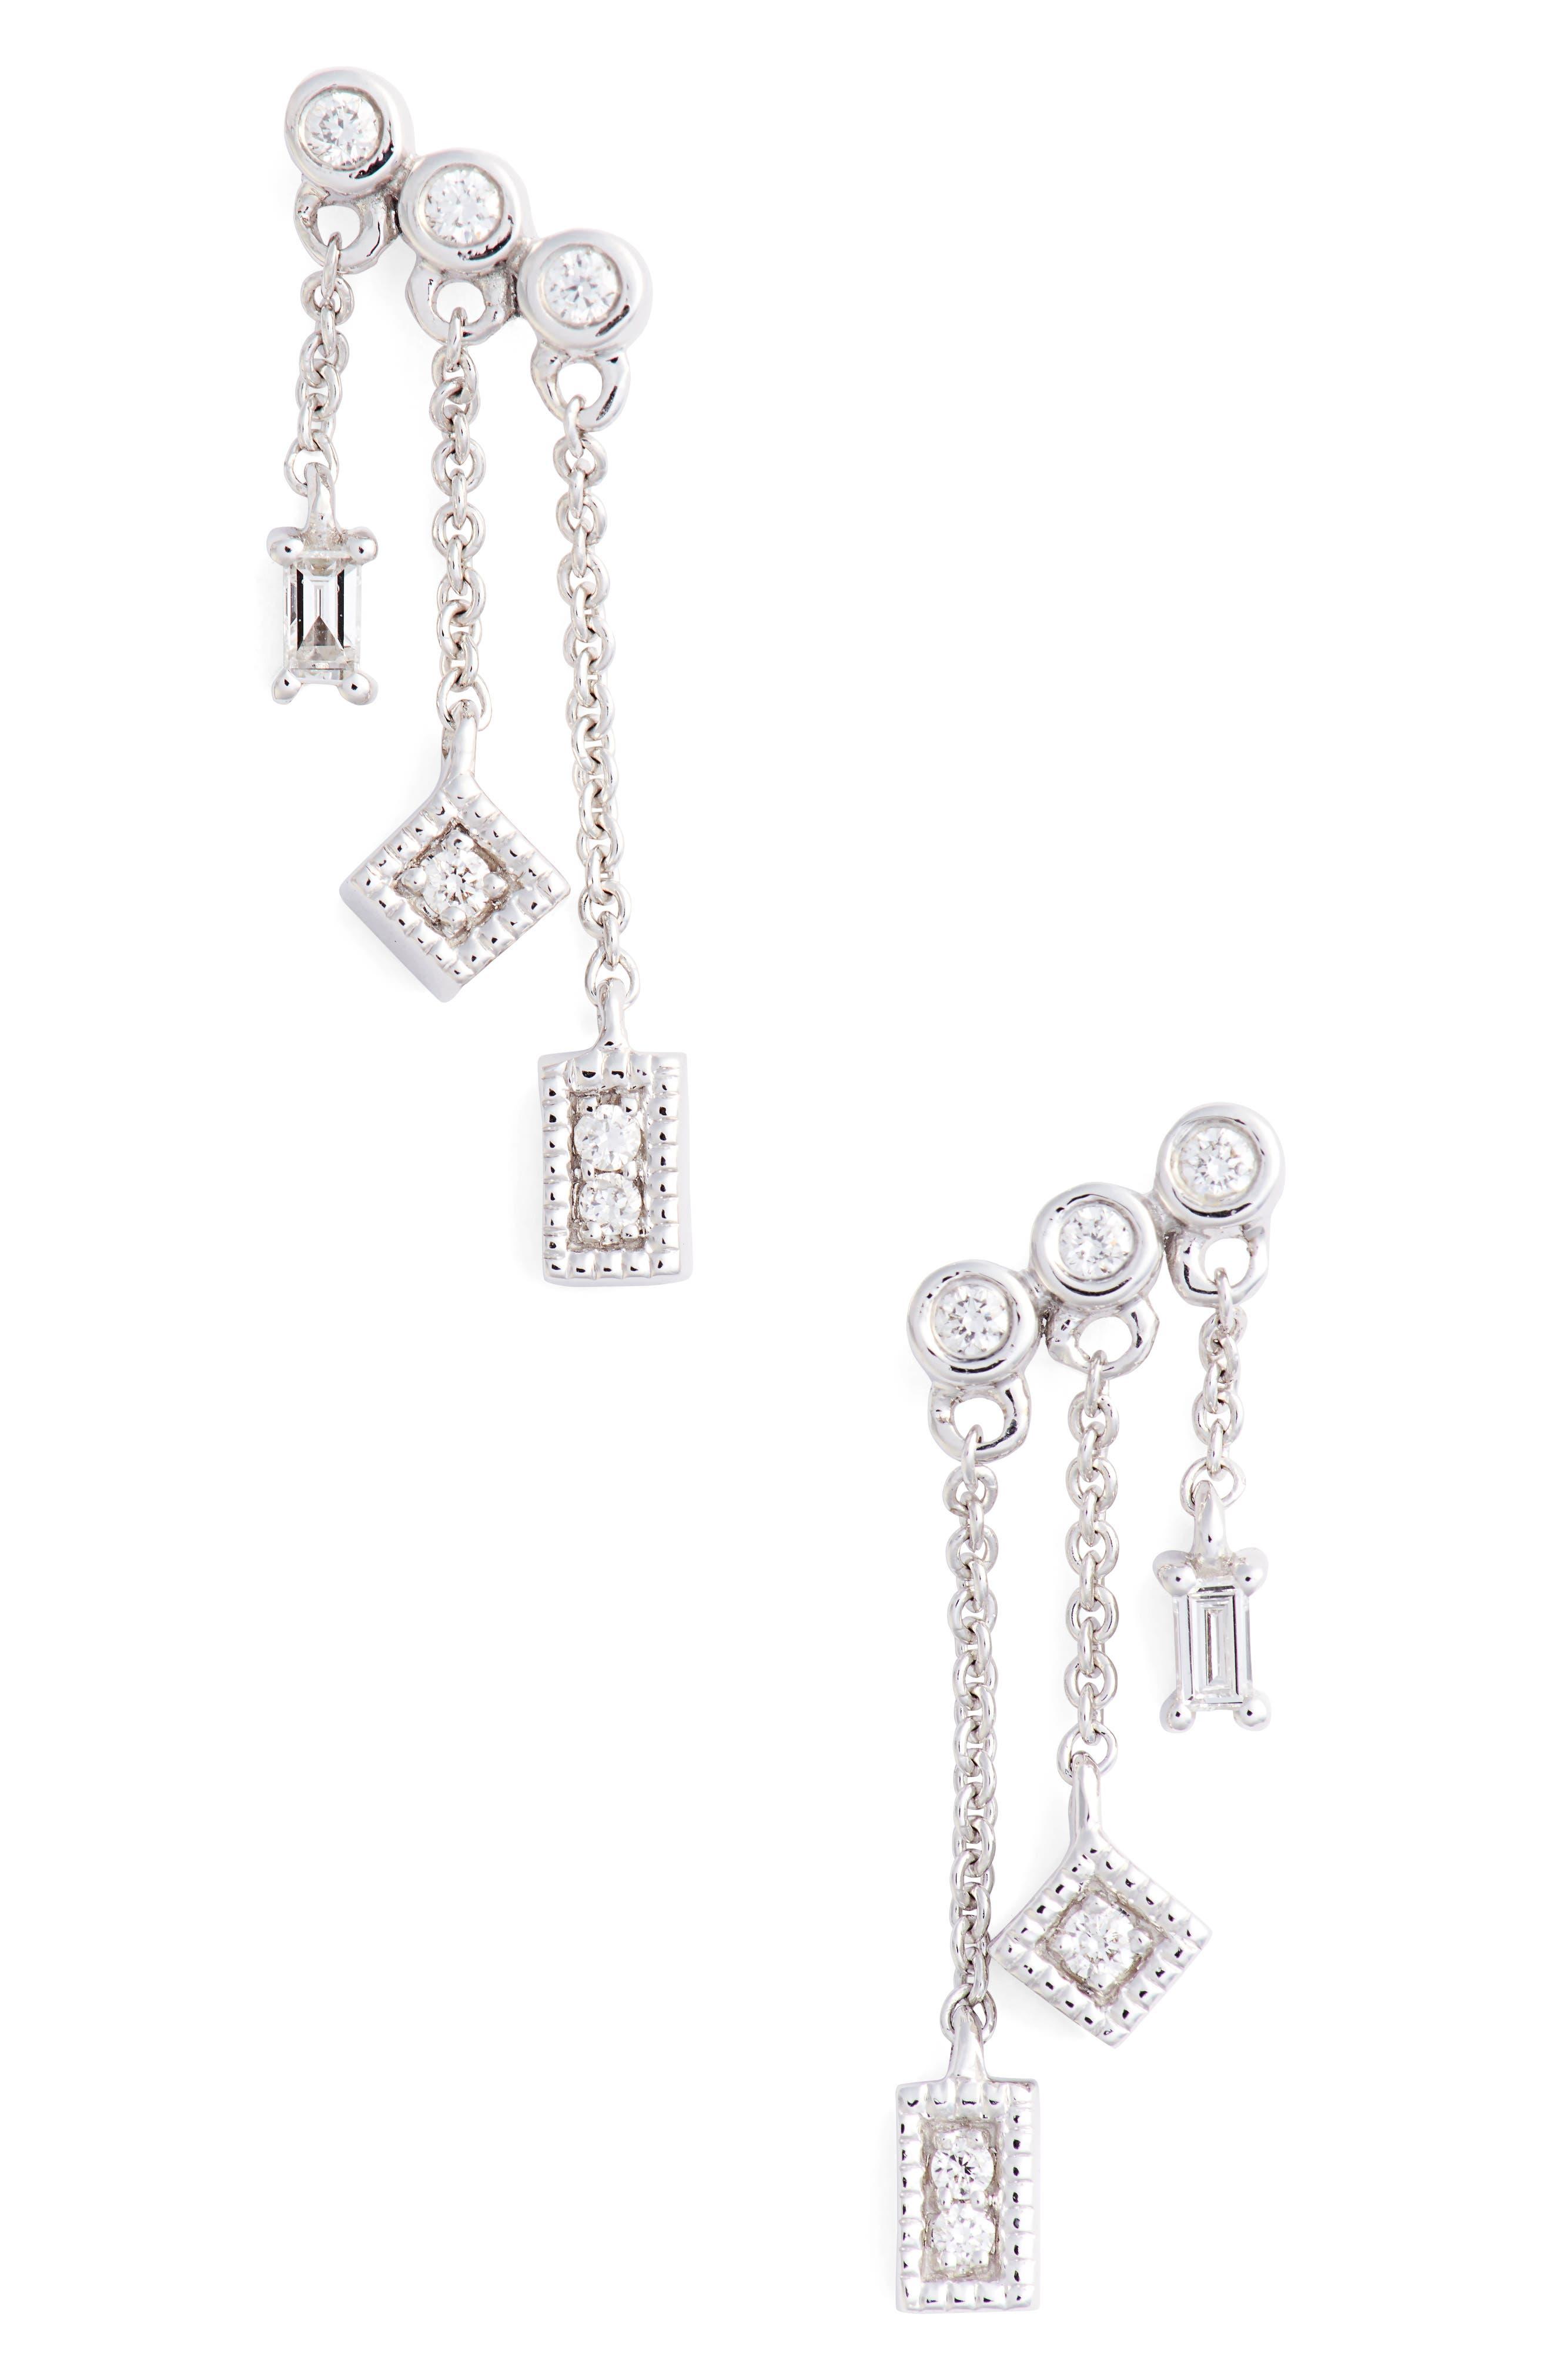 Lisa Michelle Diamond Drop Earrings,                         Main,                         color, White Gold